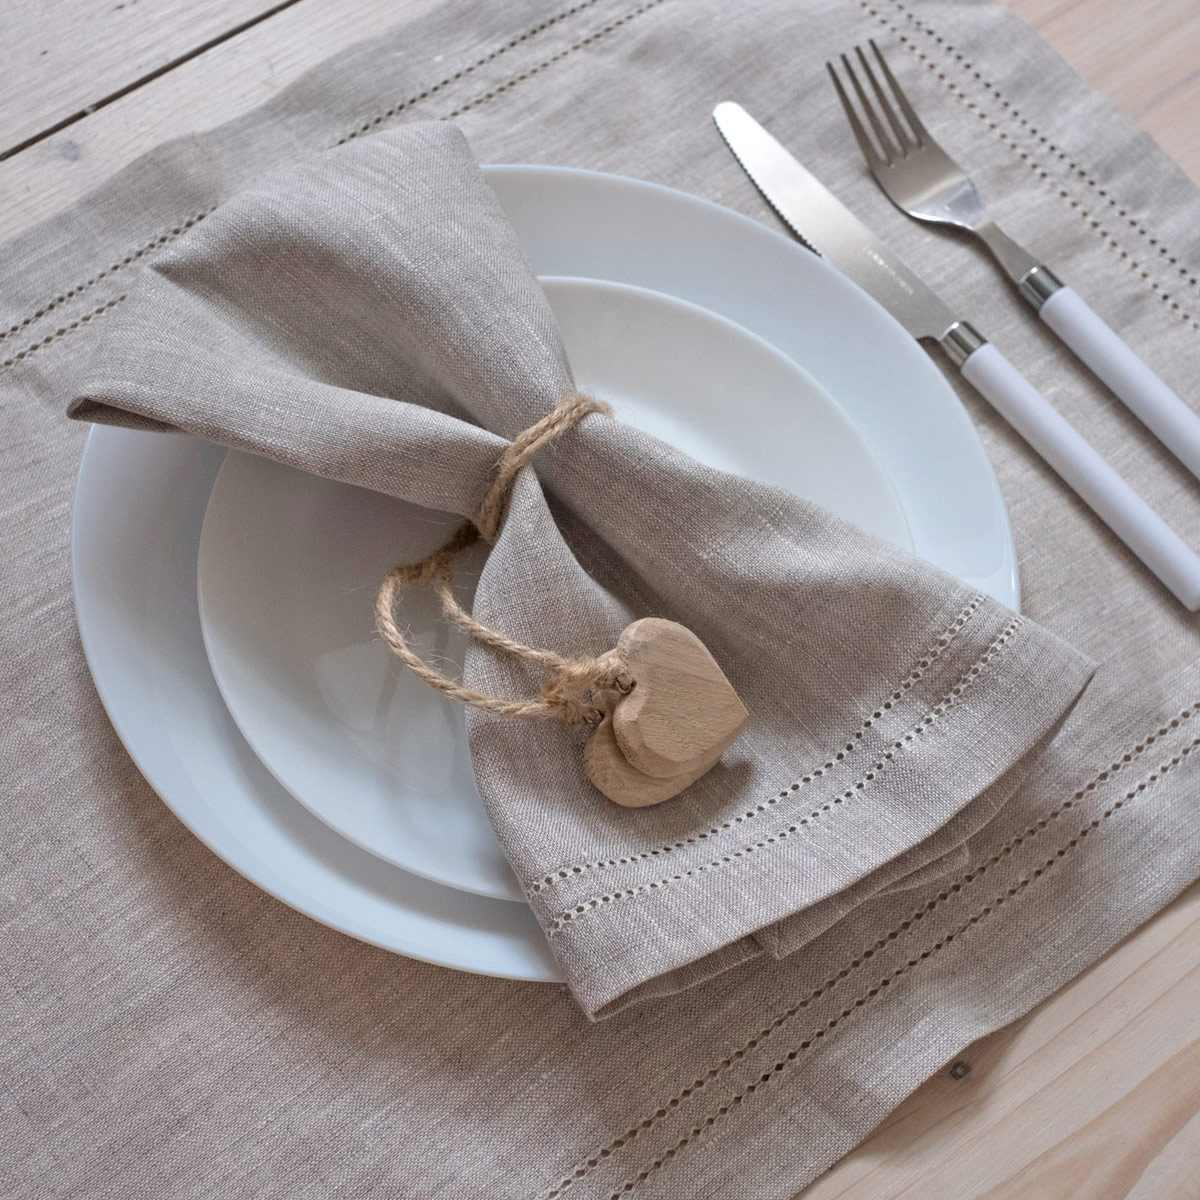 leinen servietten mit hohlsaum elbla hell natur. Black Bedroom Furniture Sets. Home Design Ideas